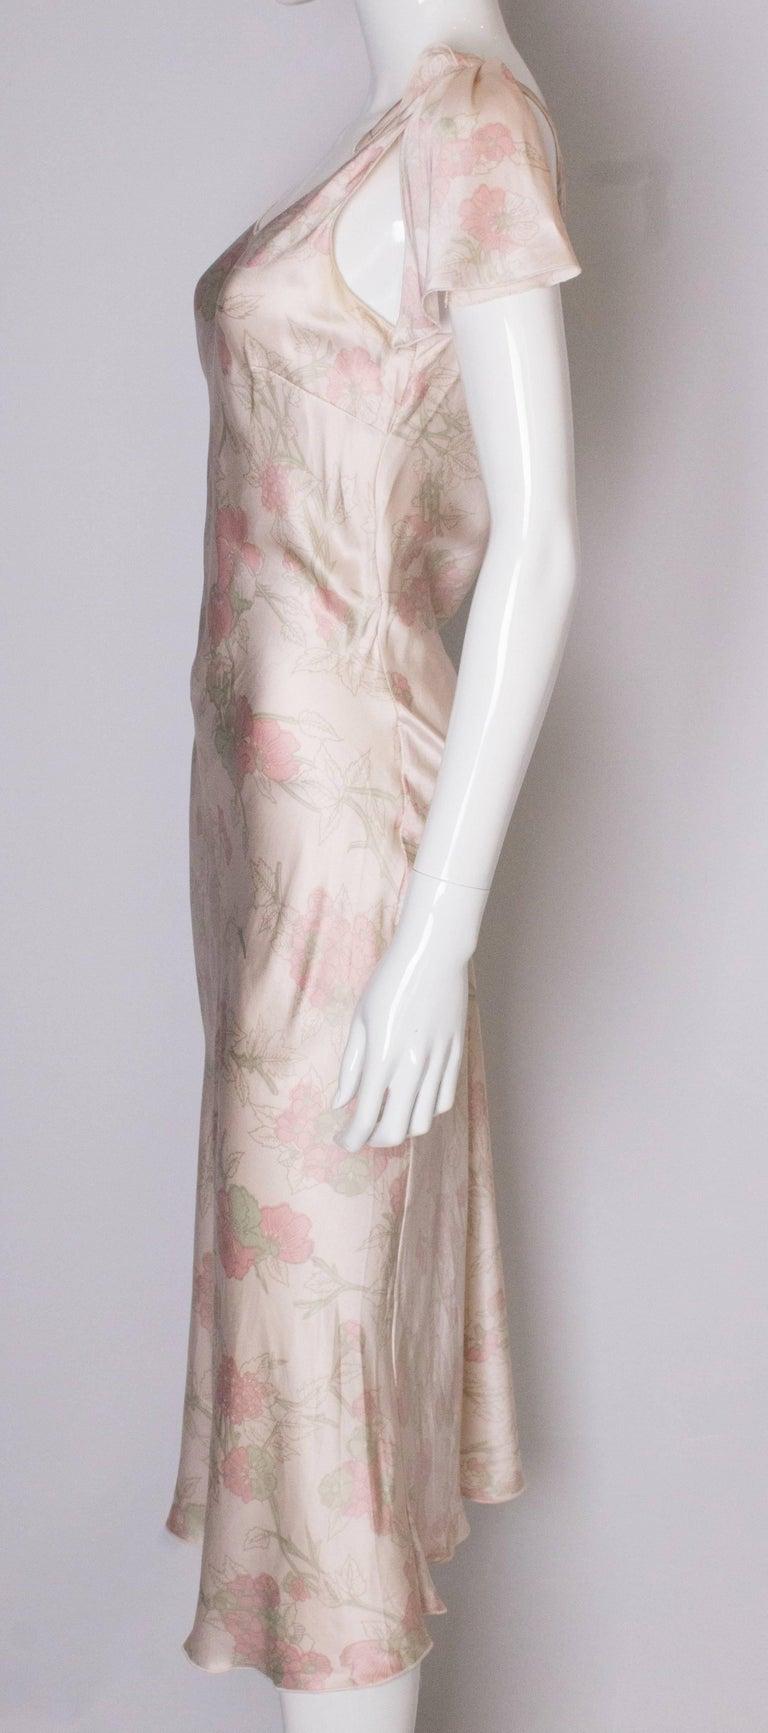 Vintage Ungaro Silk Slip Dress or Nightdress For Sale 1